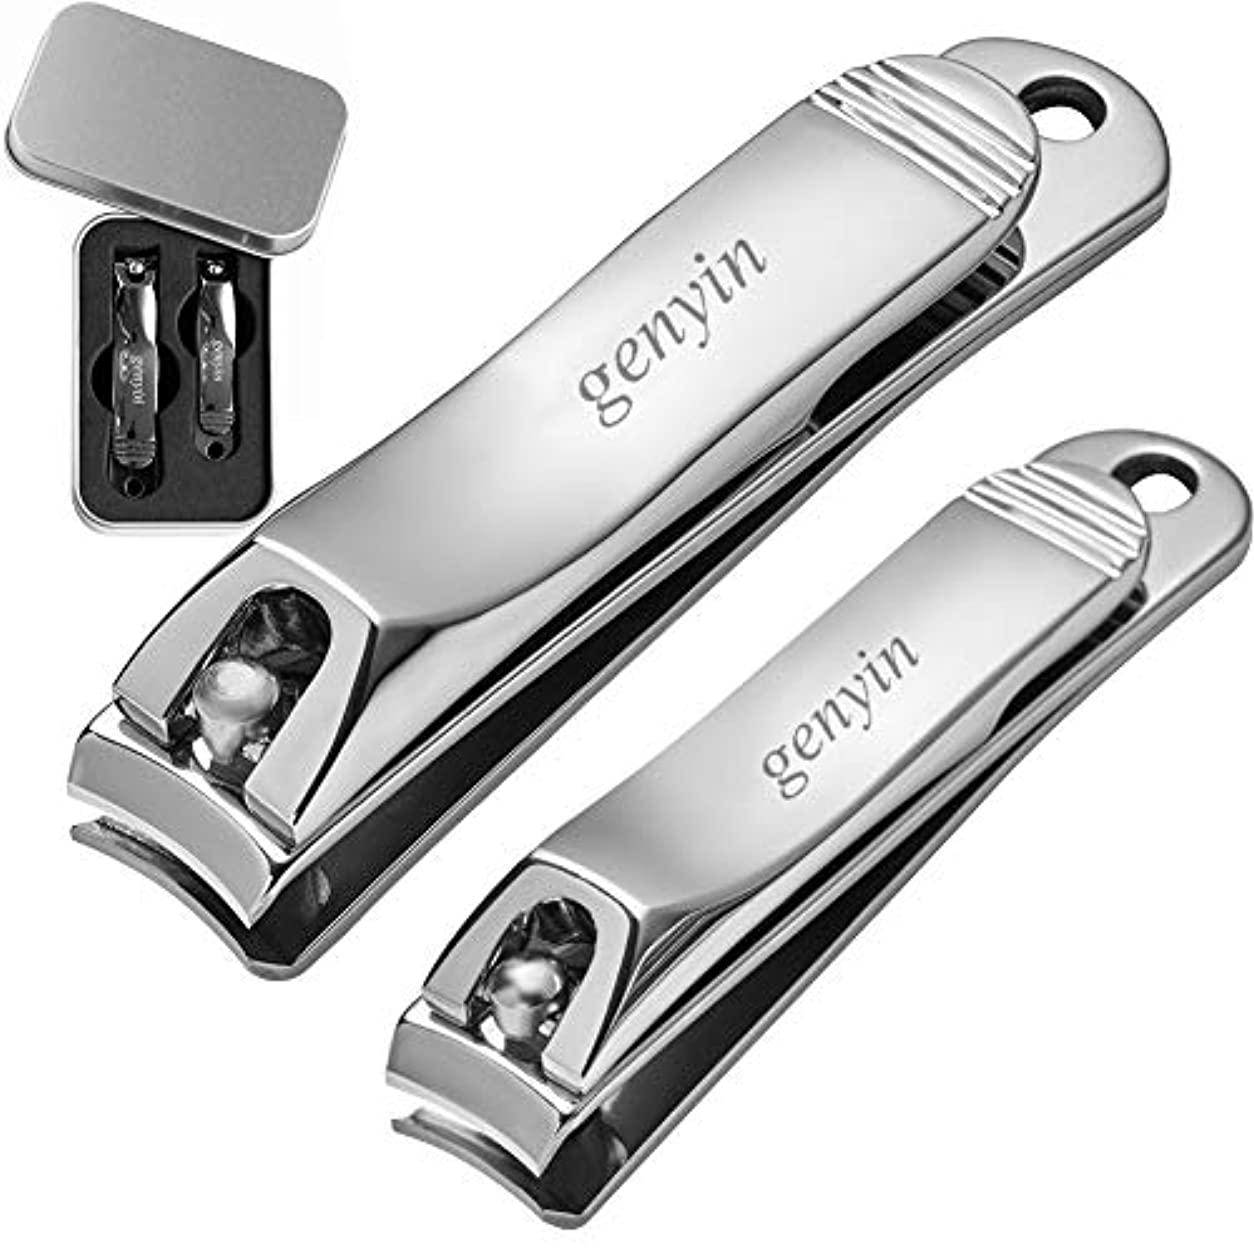 genyin 爪切り つめきり ツメキリ 爪やすり 高級ステンレス鋼製 収納ケース付き 2本セット